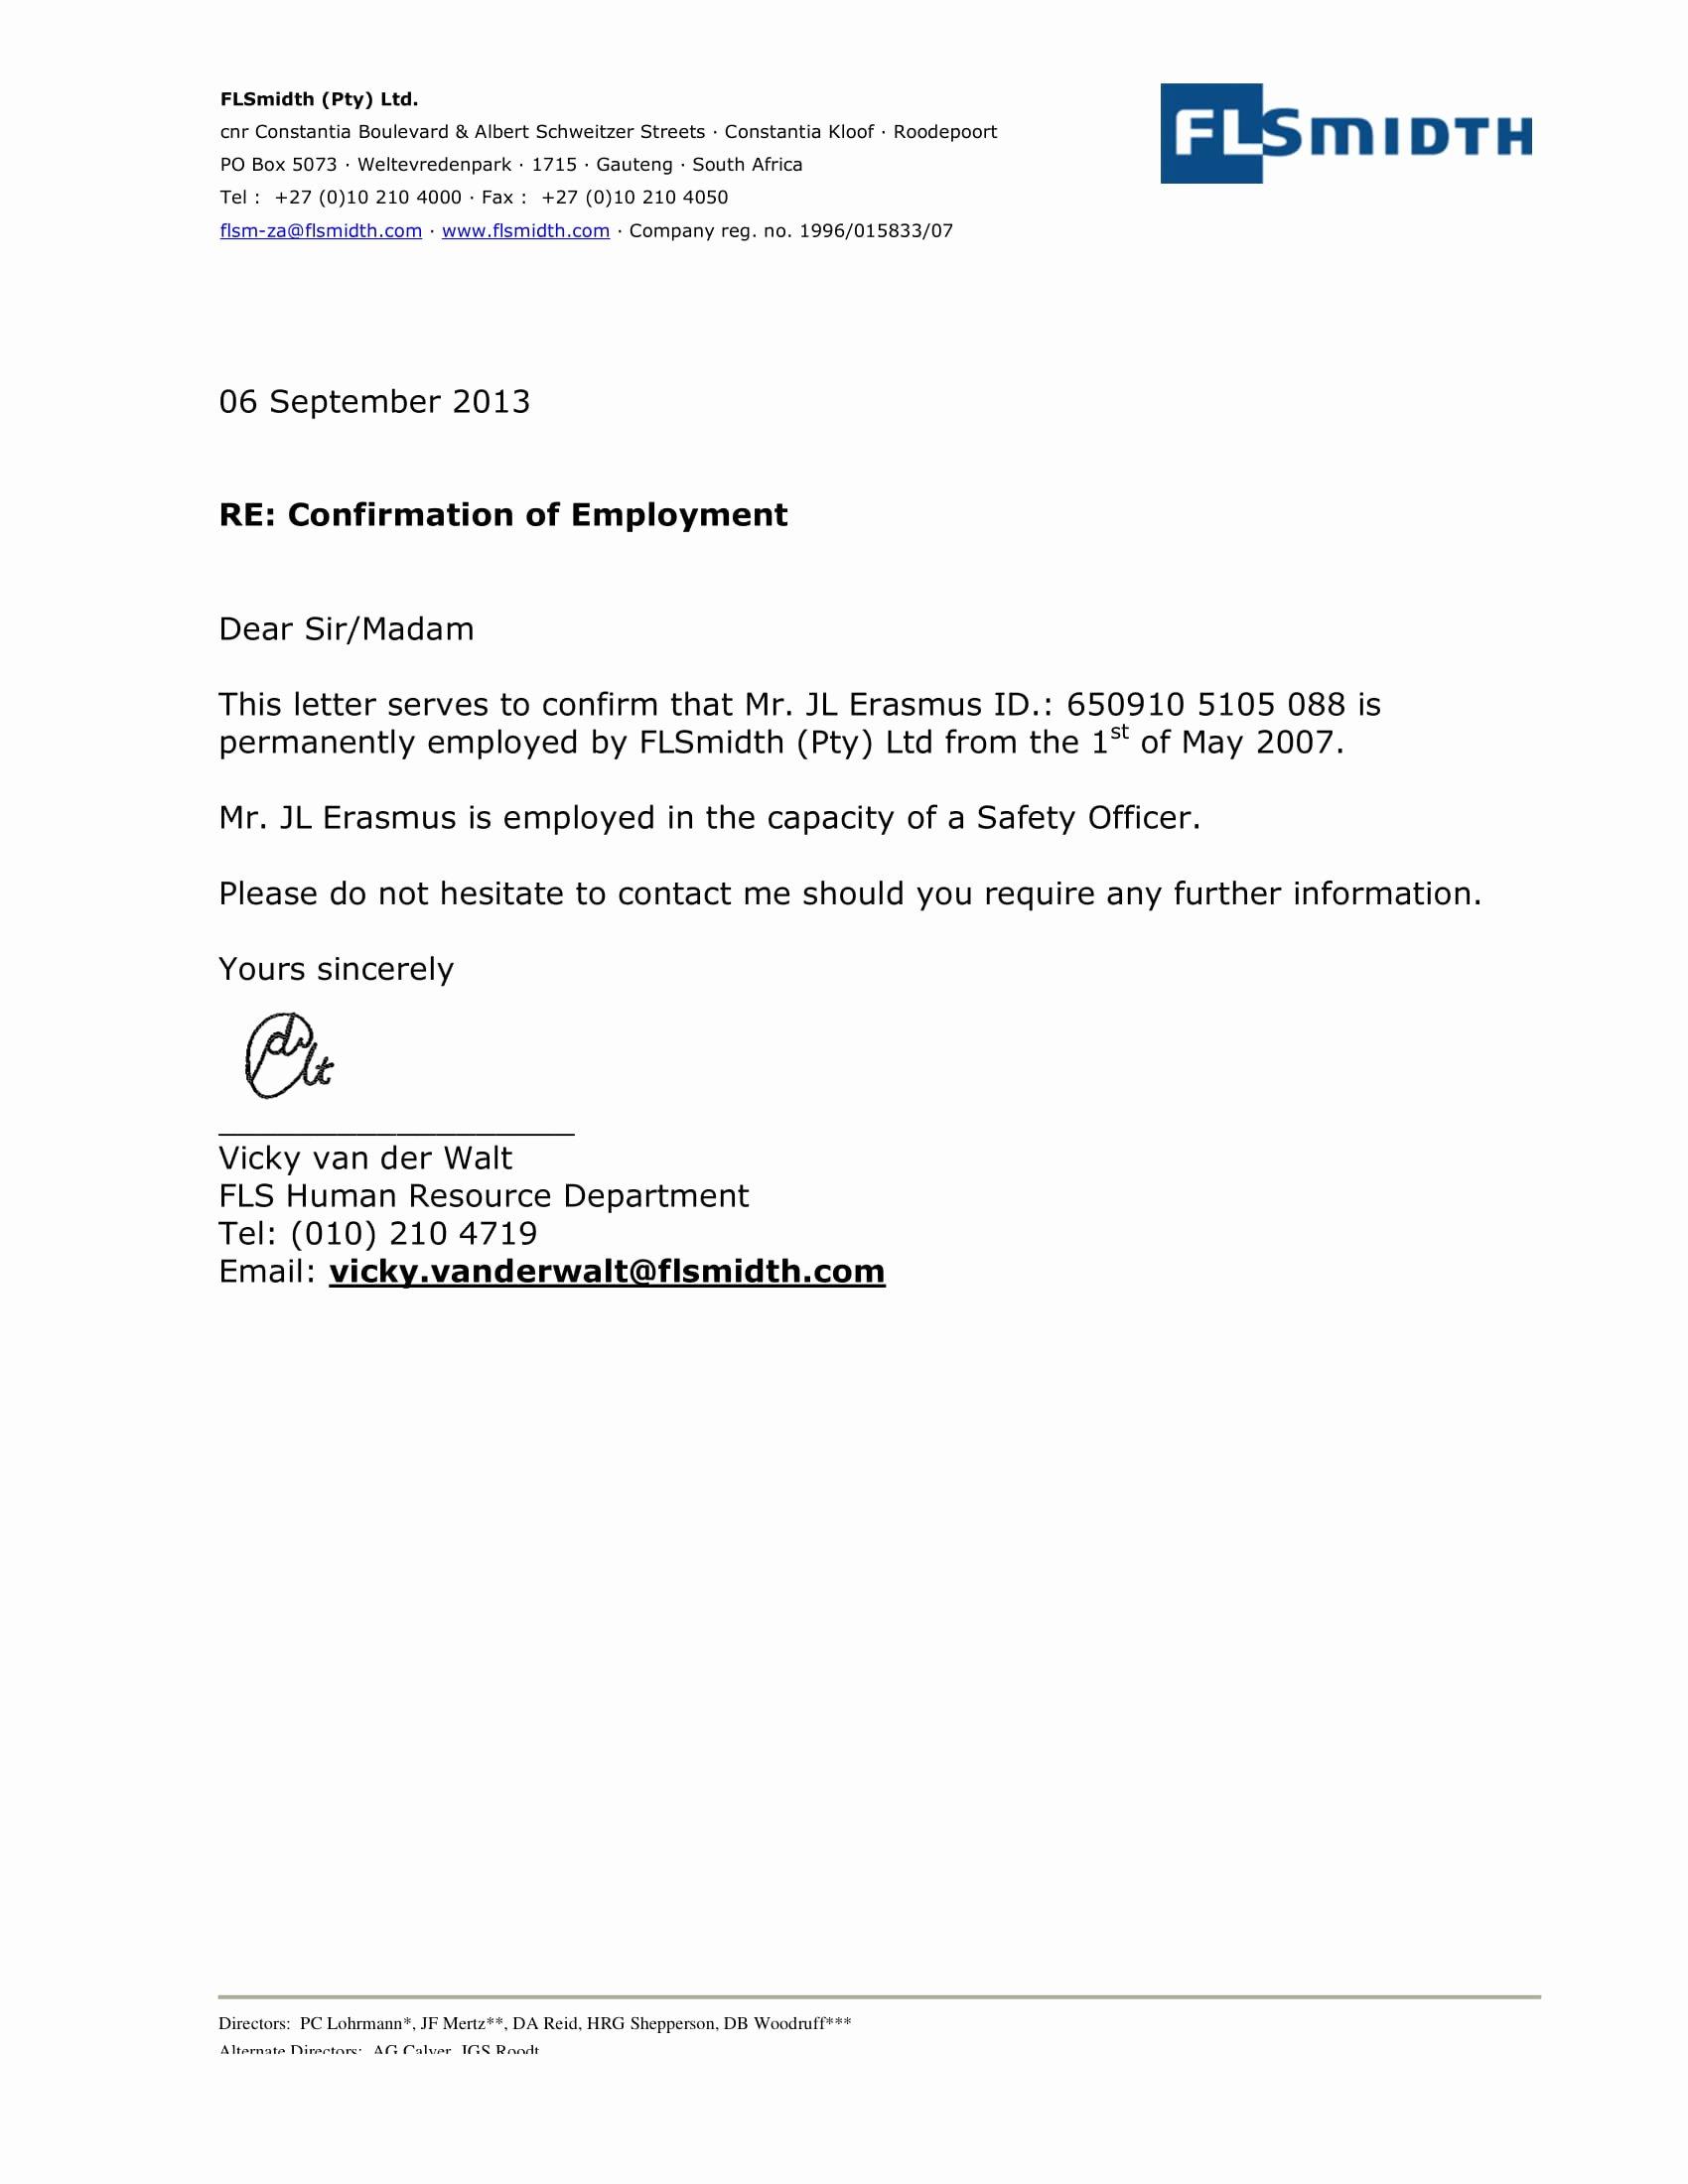 Employment Verification Letter for Immigration Lovely 29 Verification Letter Examples Pdf